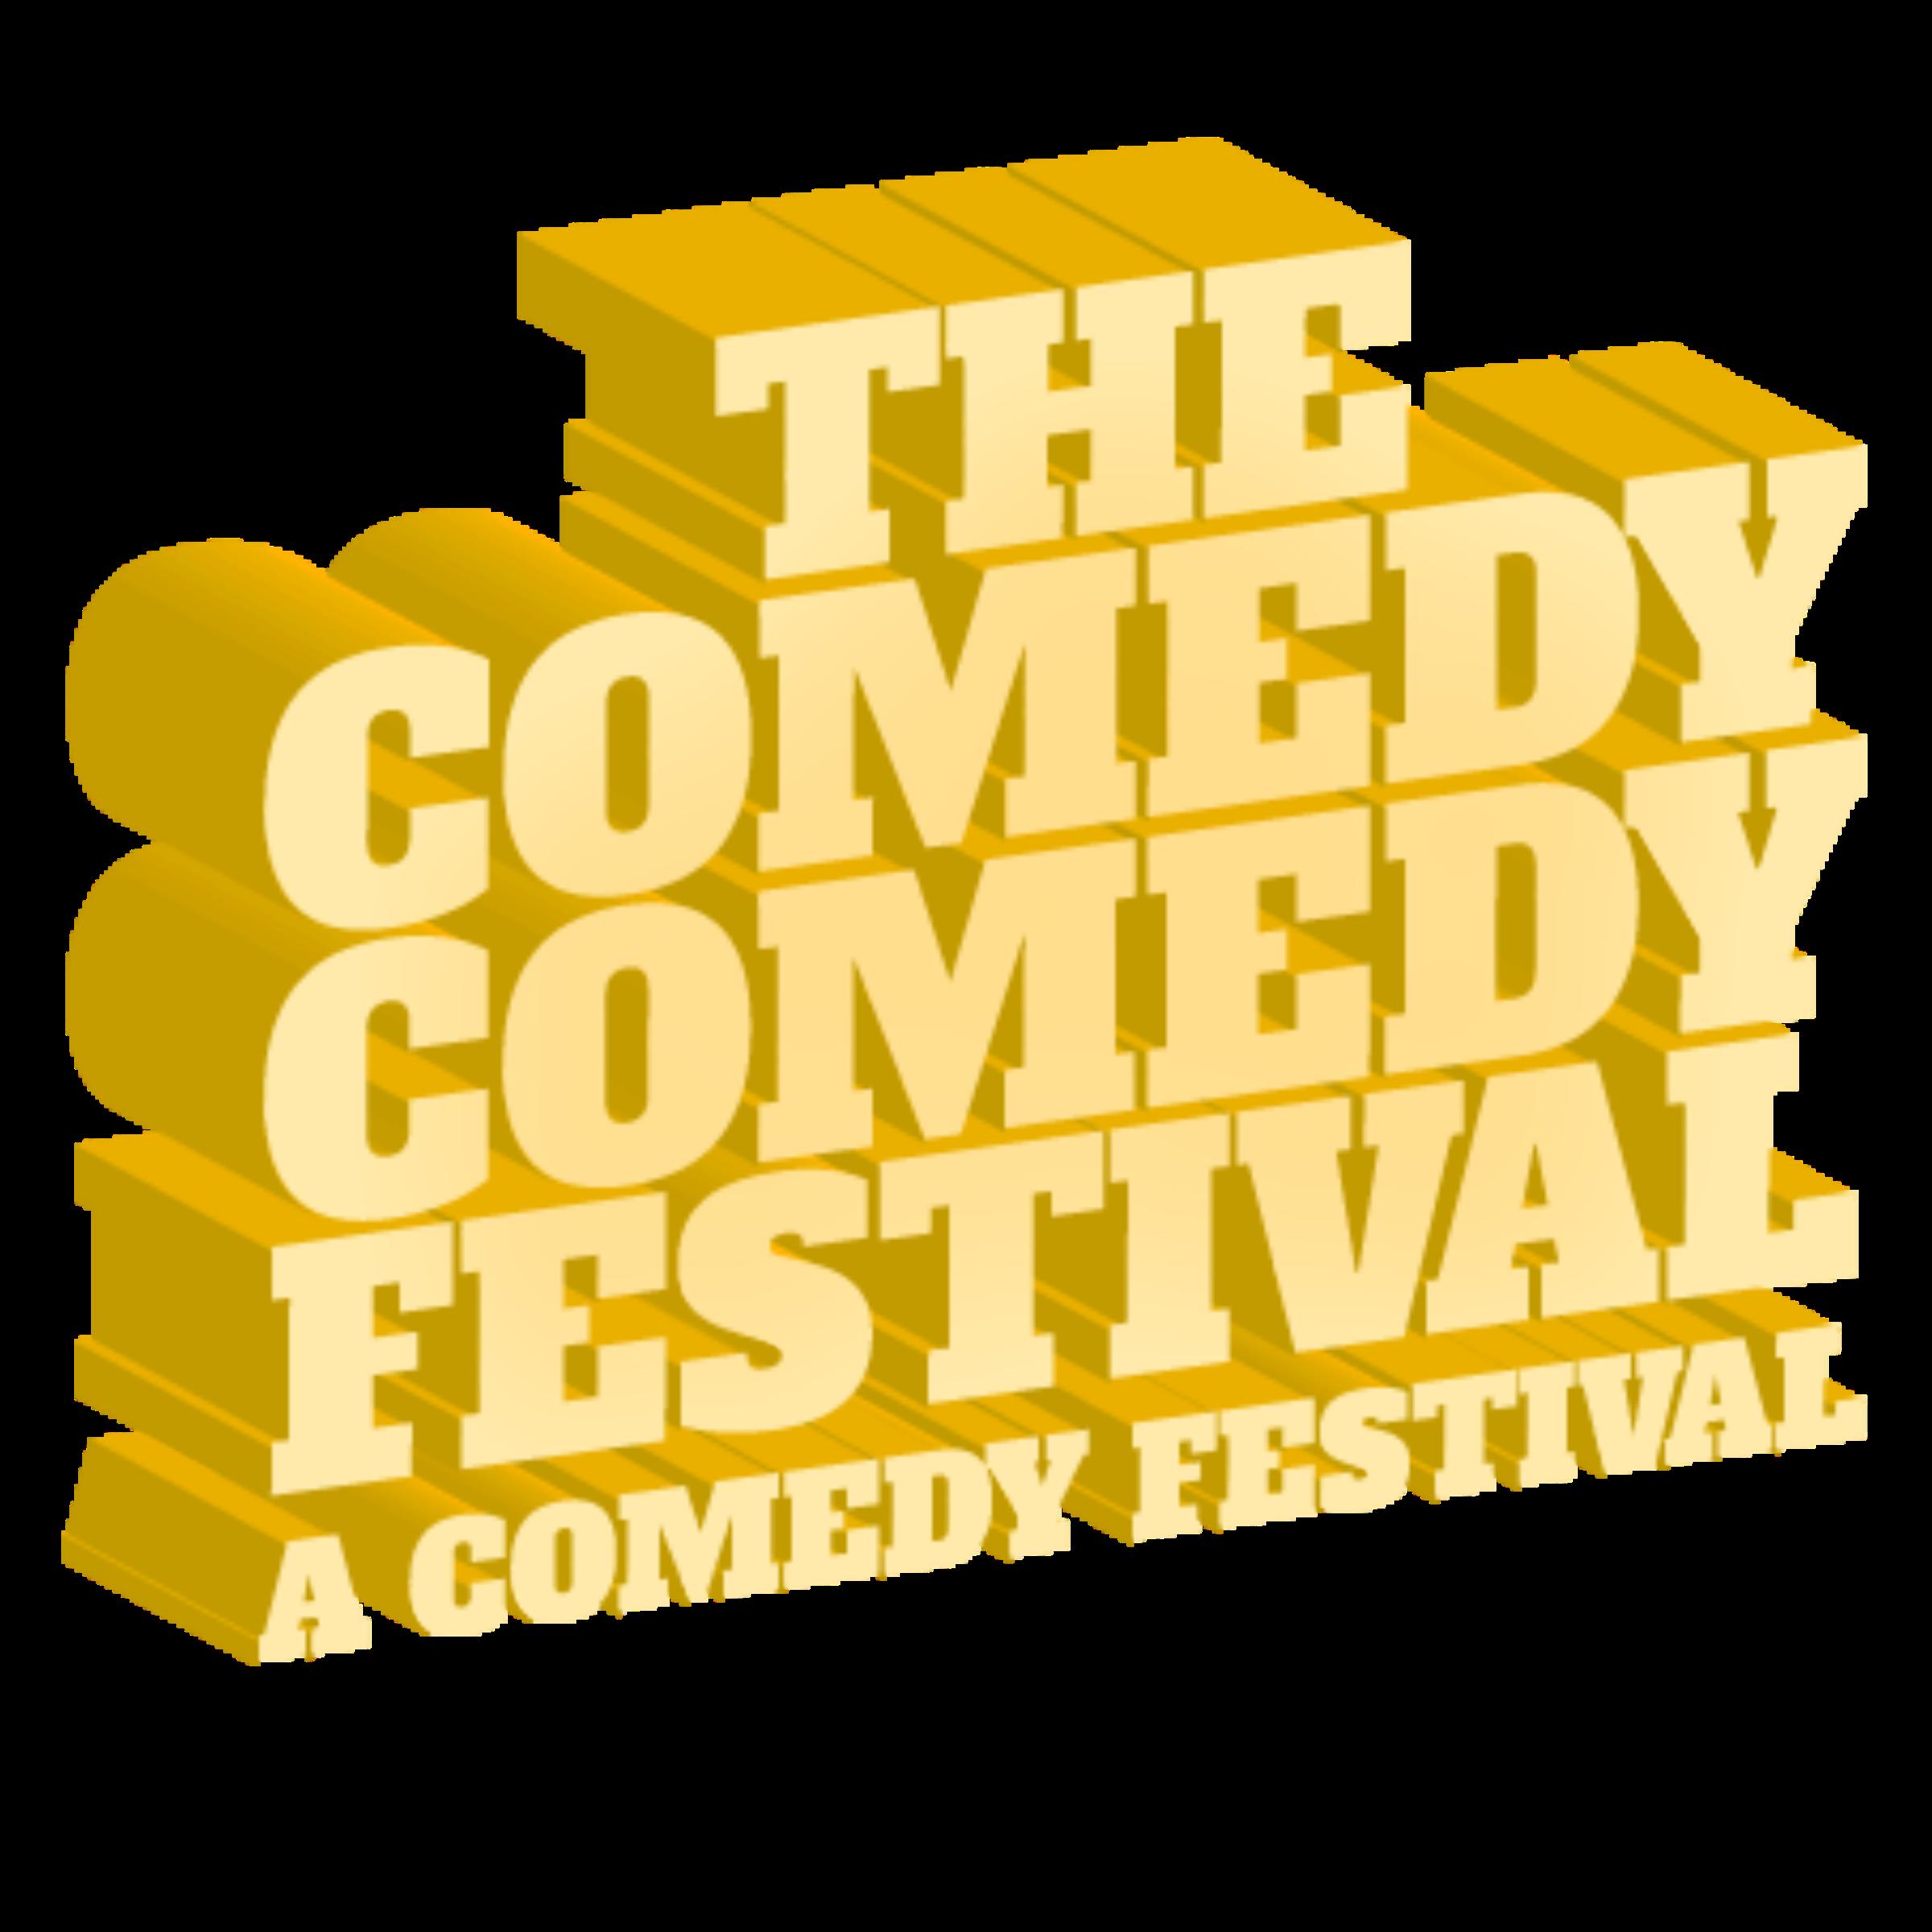 The Comedy Comedy Festival: A Comedy Festival - LOGO. PNG. Transparent.